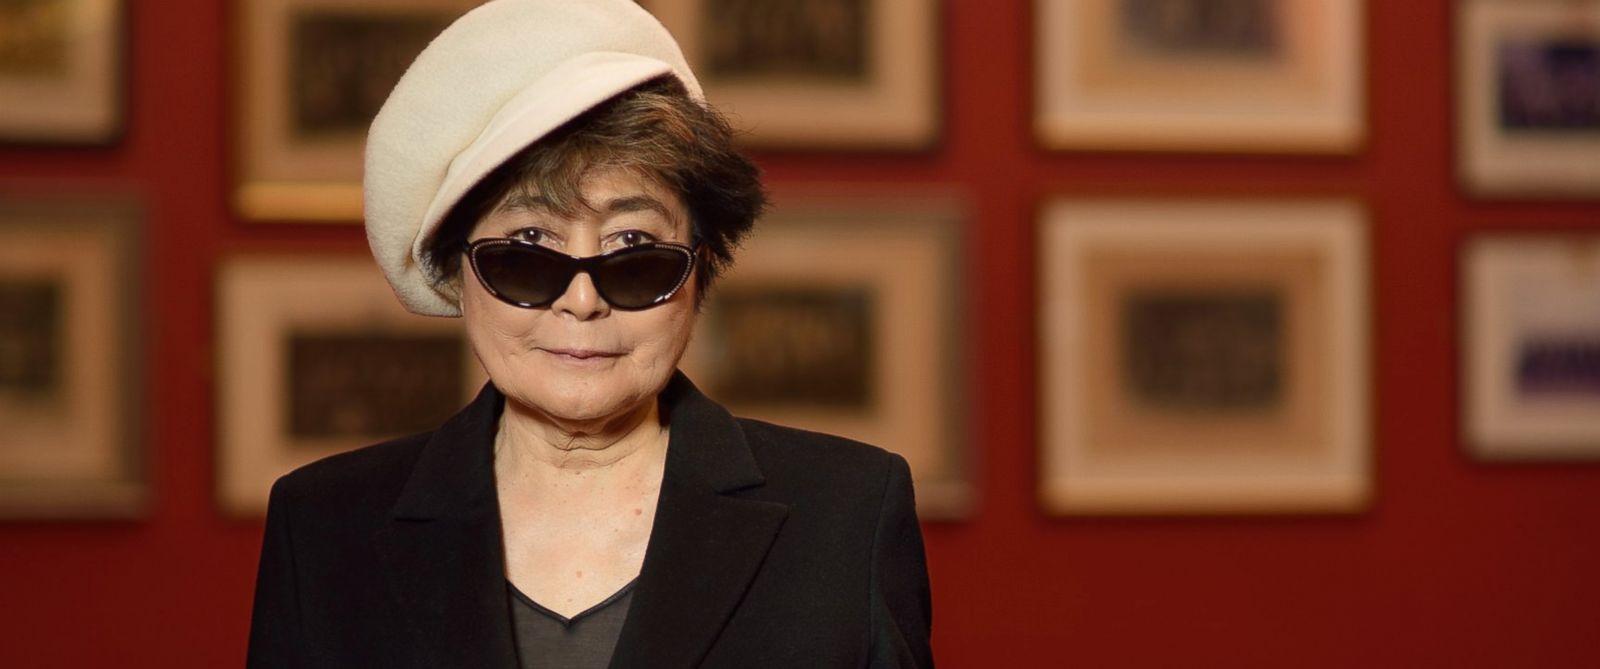 Yoko Ono poses for a p...